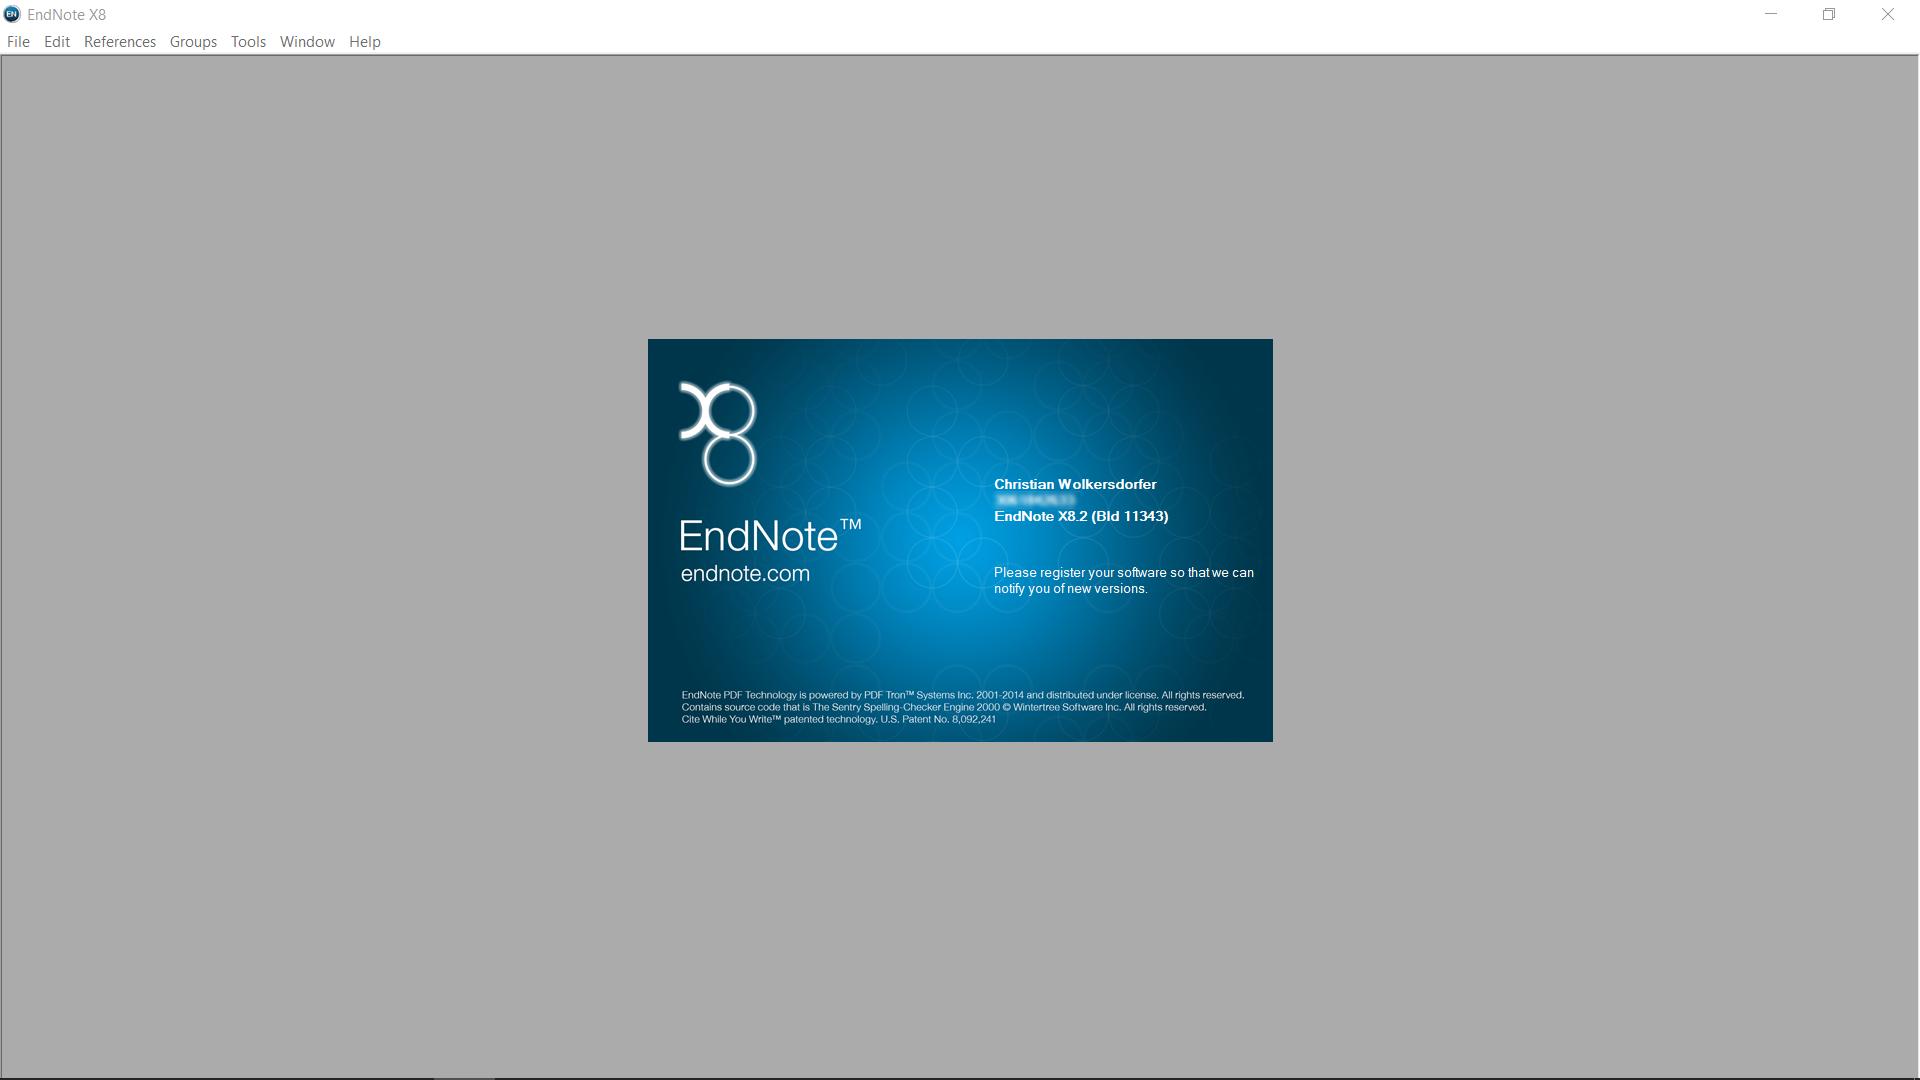 endnote 8 download